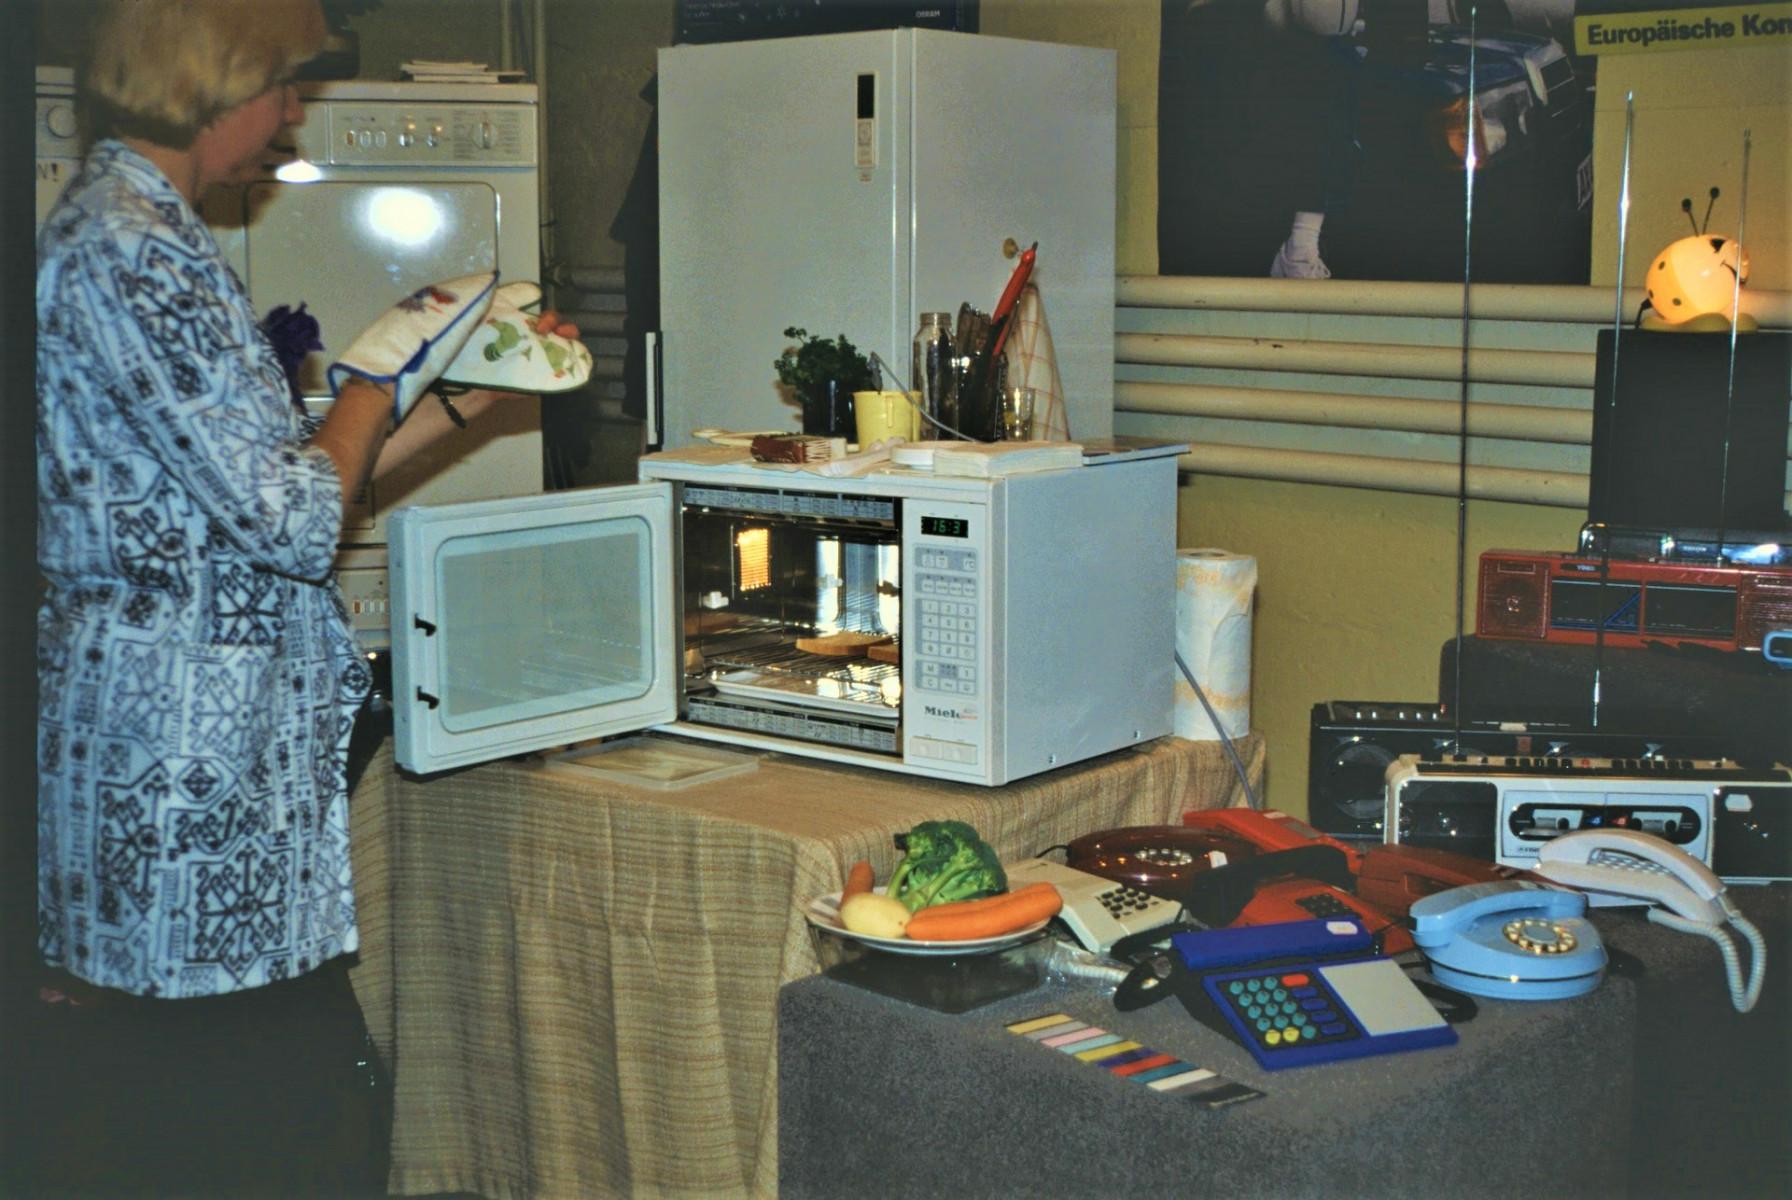 Gewerbeausstellung Elektro Brizzi